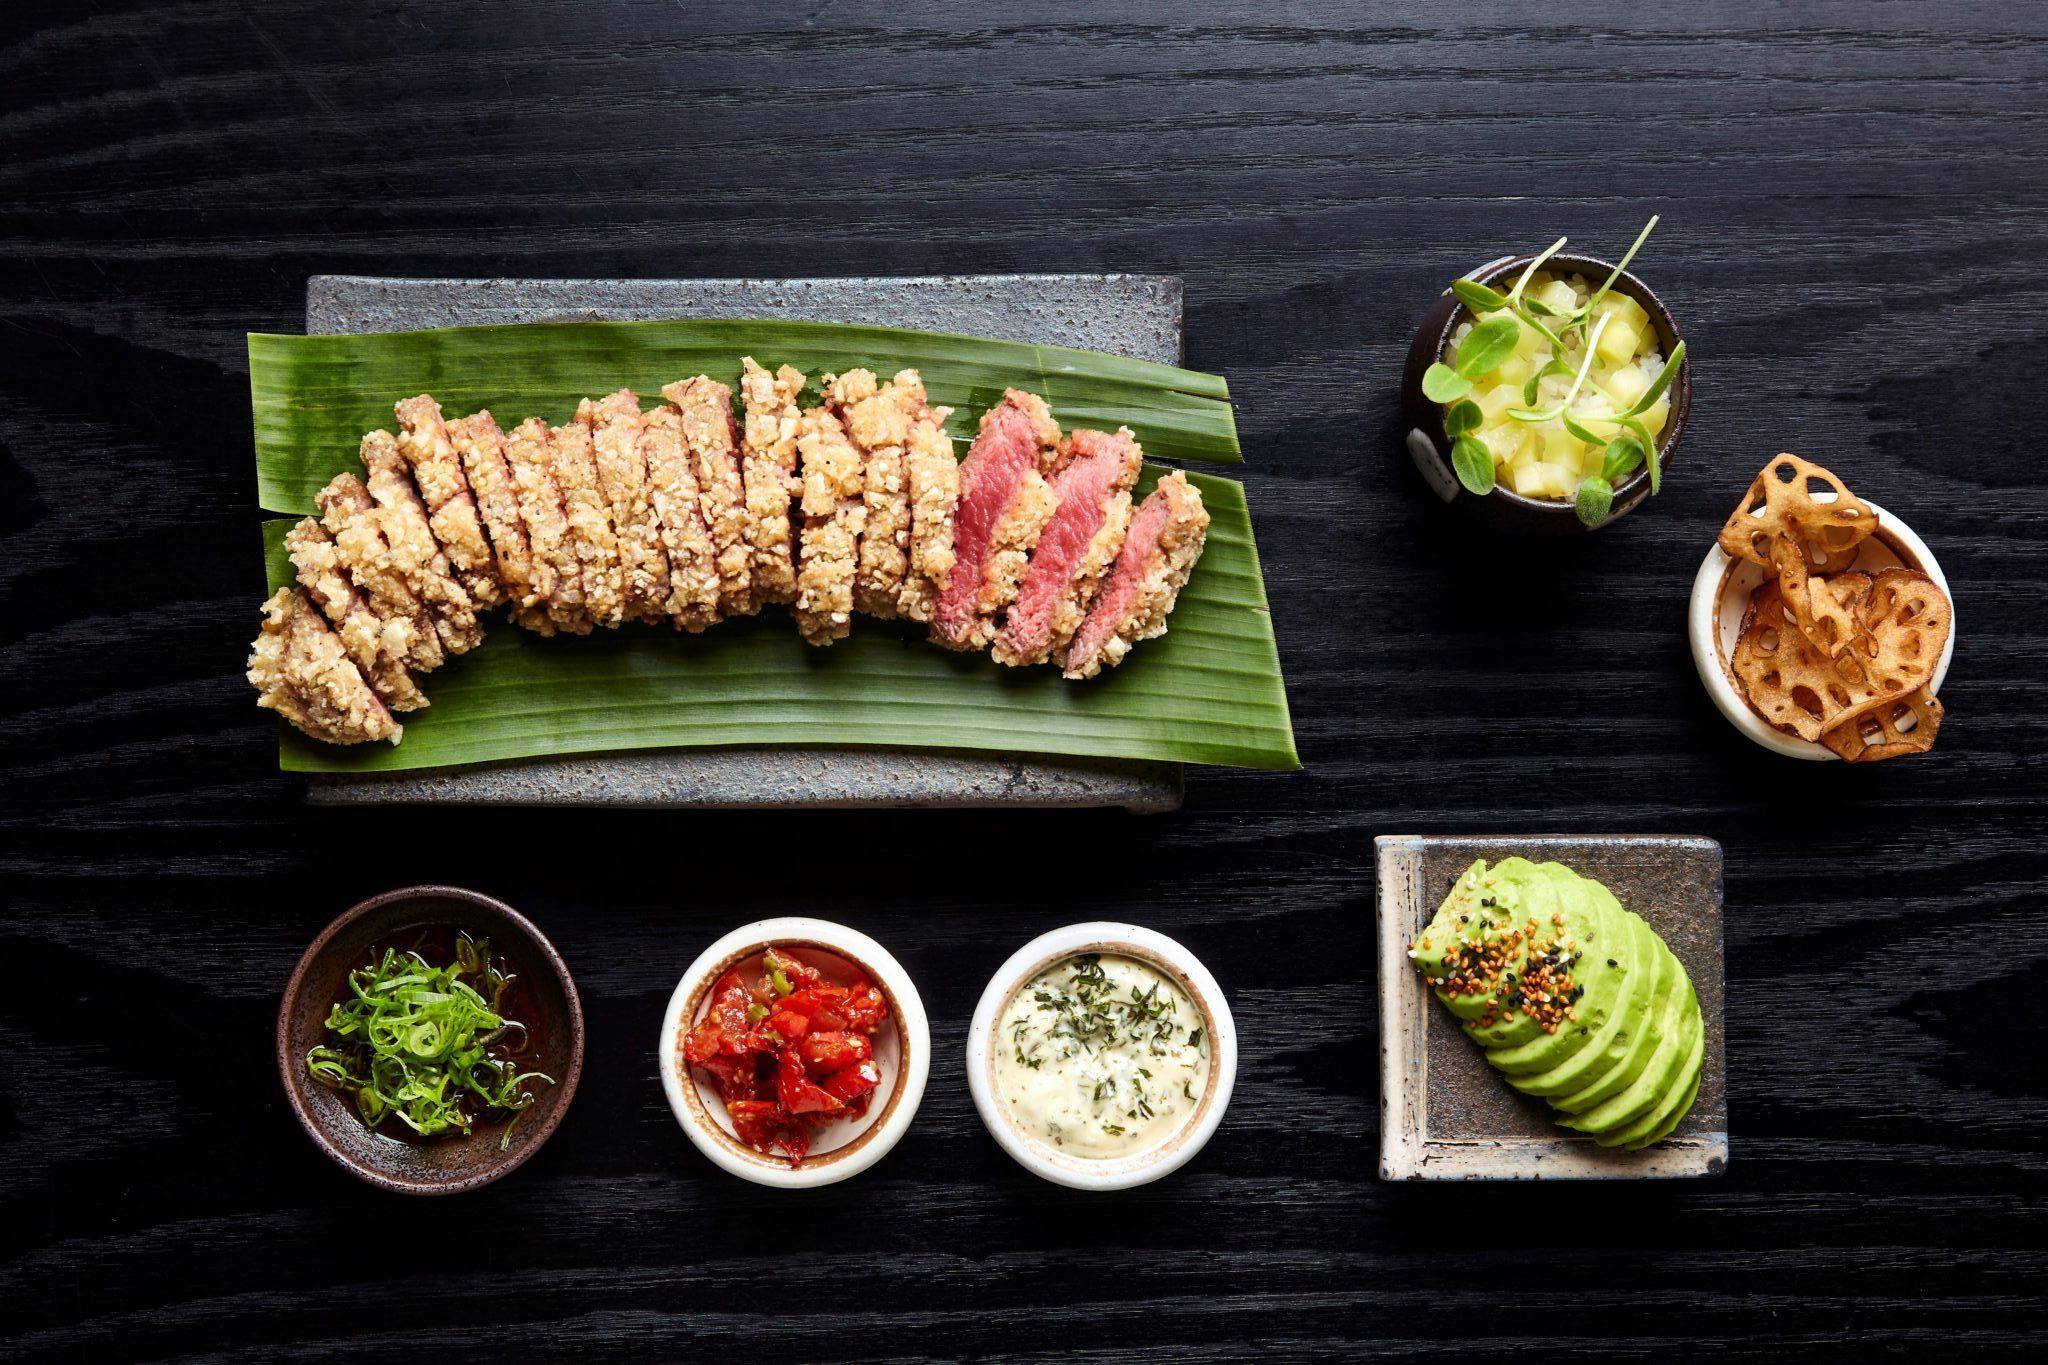 Sushi-restaurant i Aarhus får japansk bøf på menuen